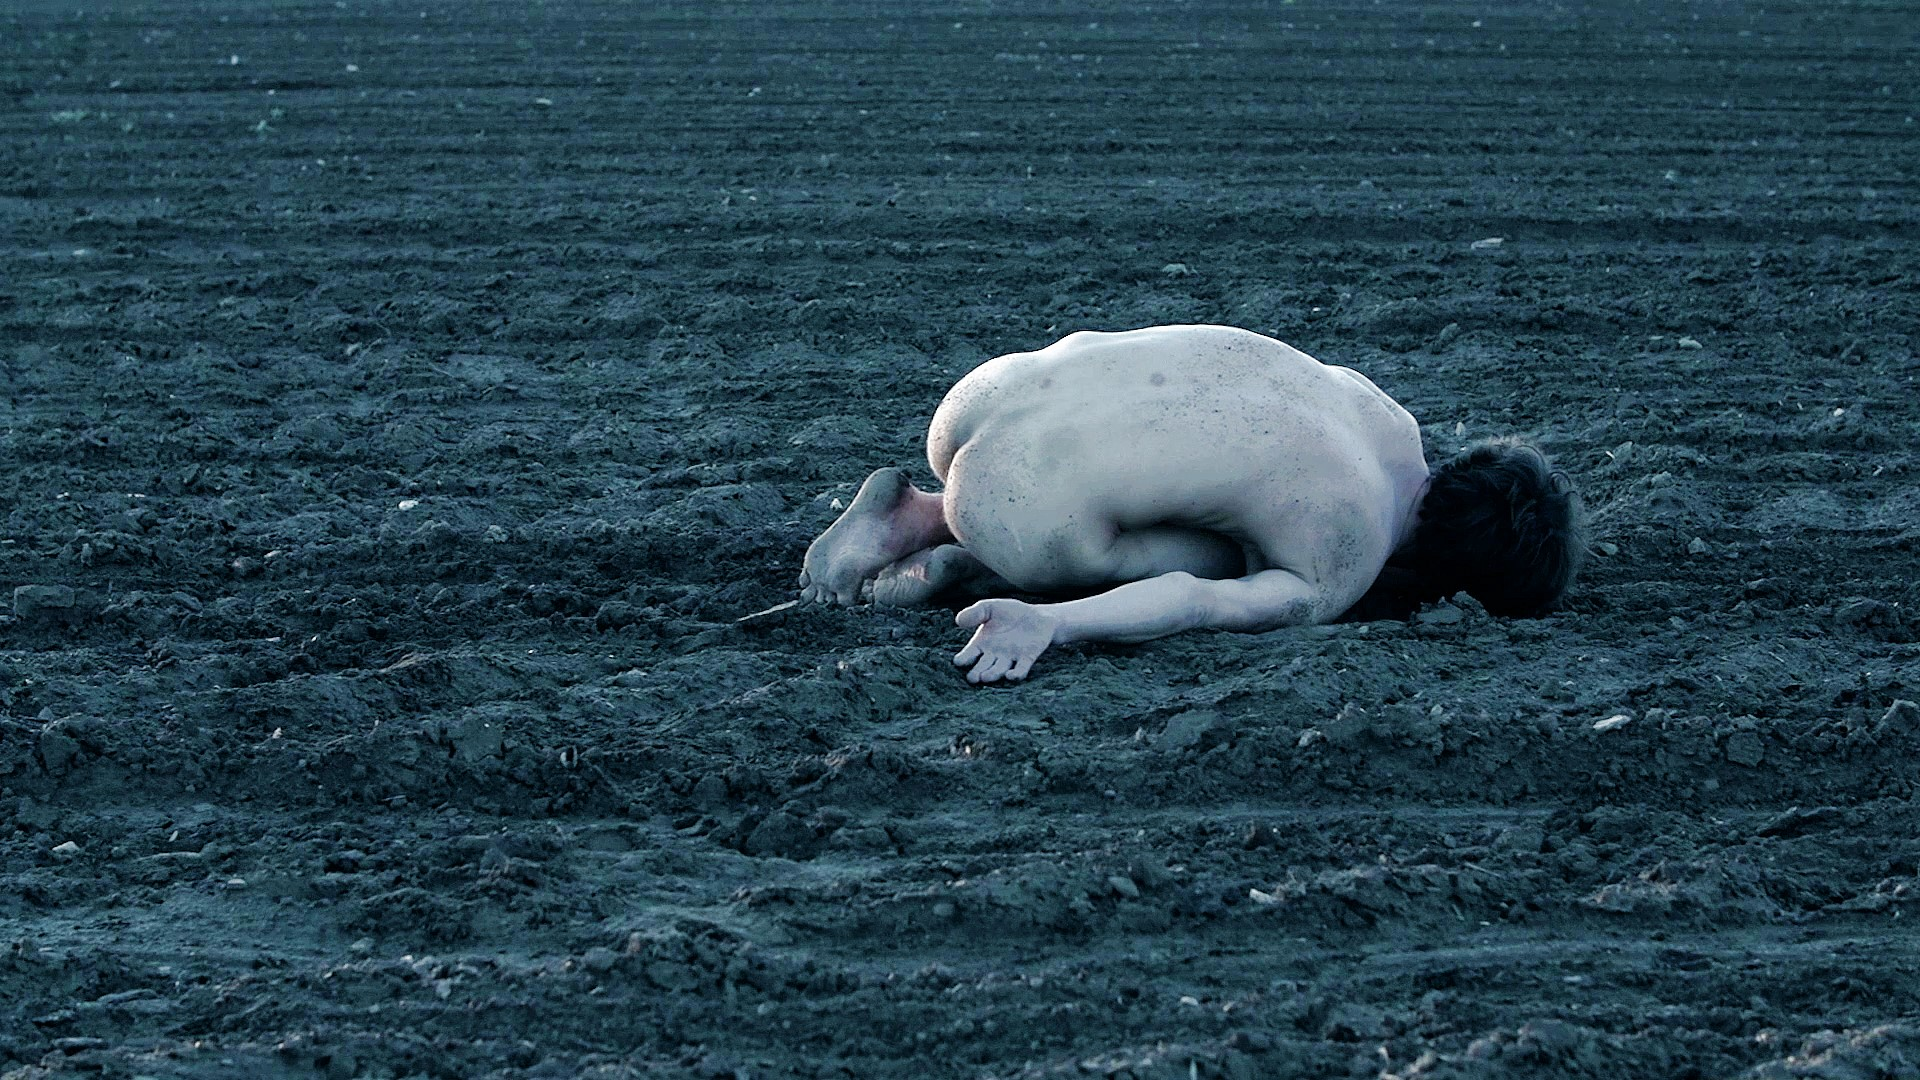 Maria-Judova_Metaphors-of-the-body.jpg